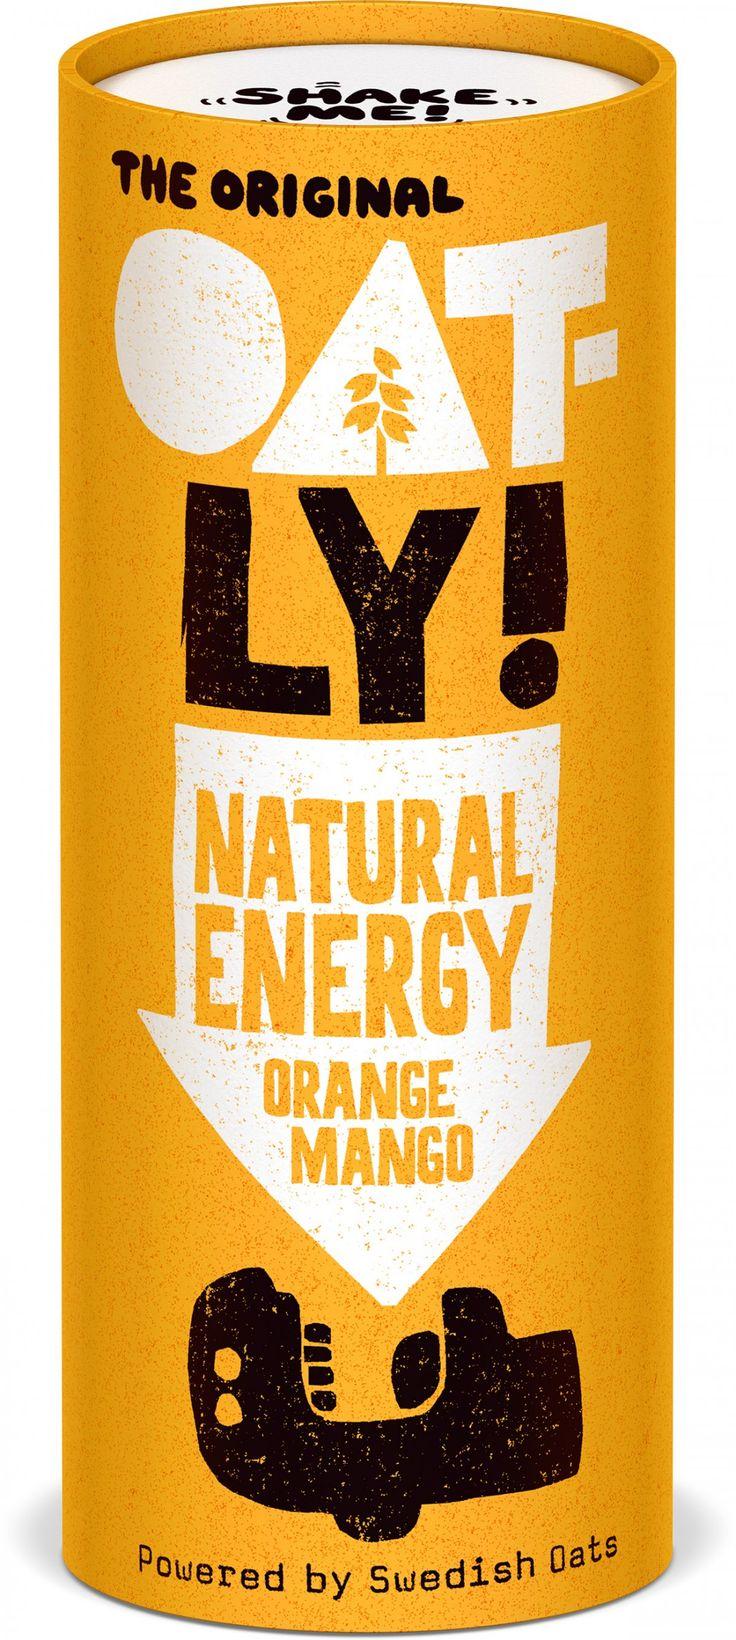 Natural Energy Appelsiini ja Mango | Oatly